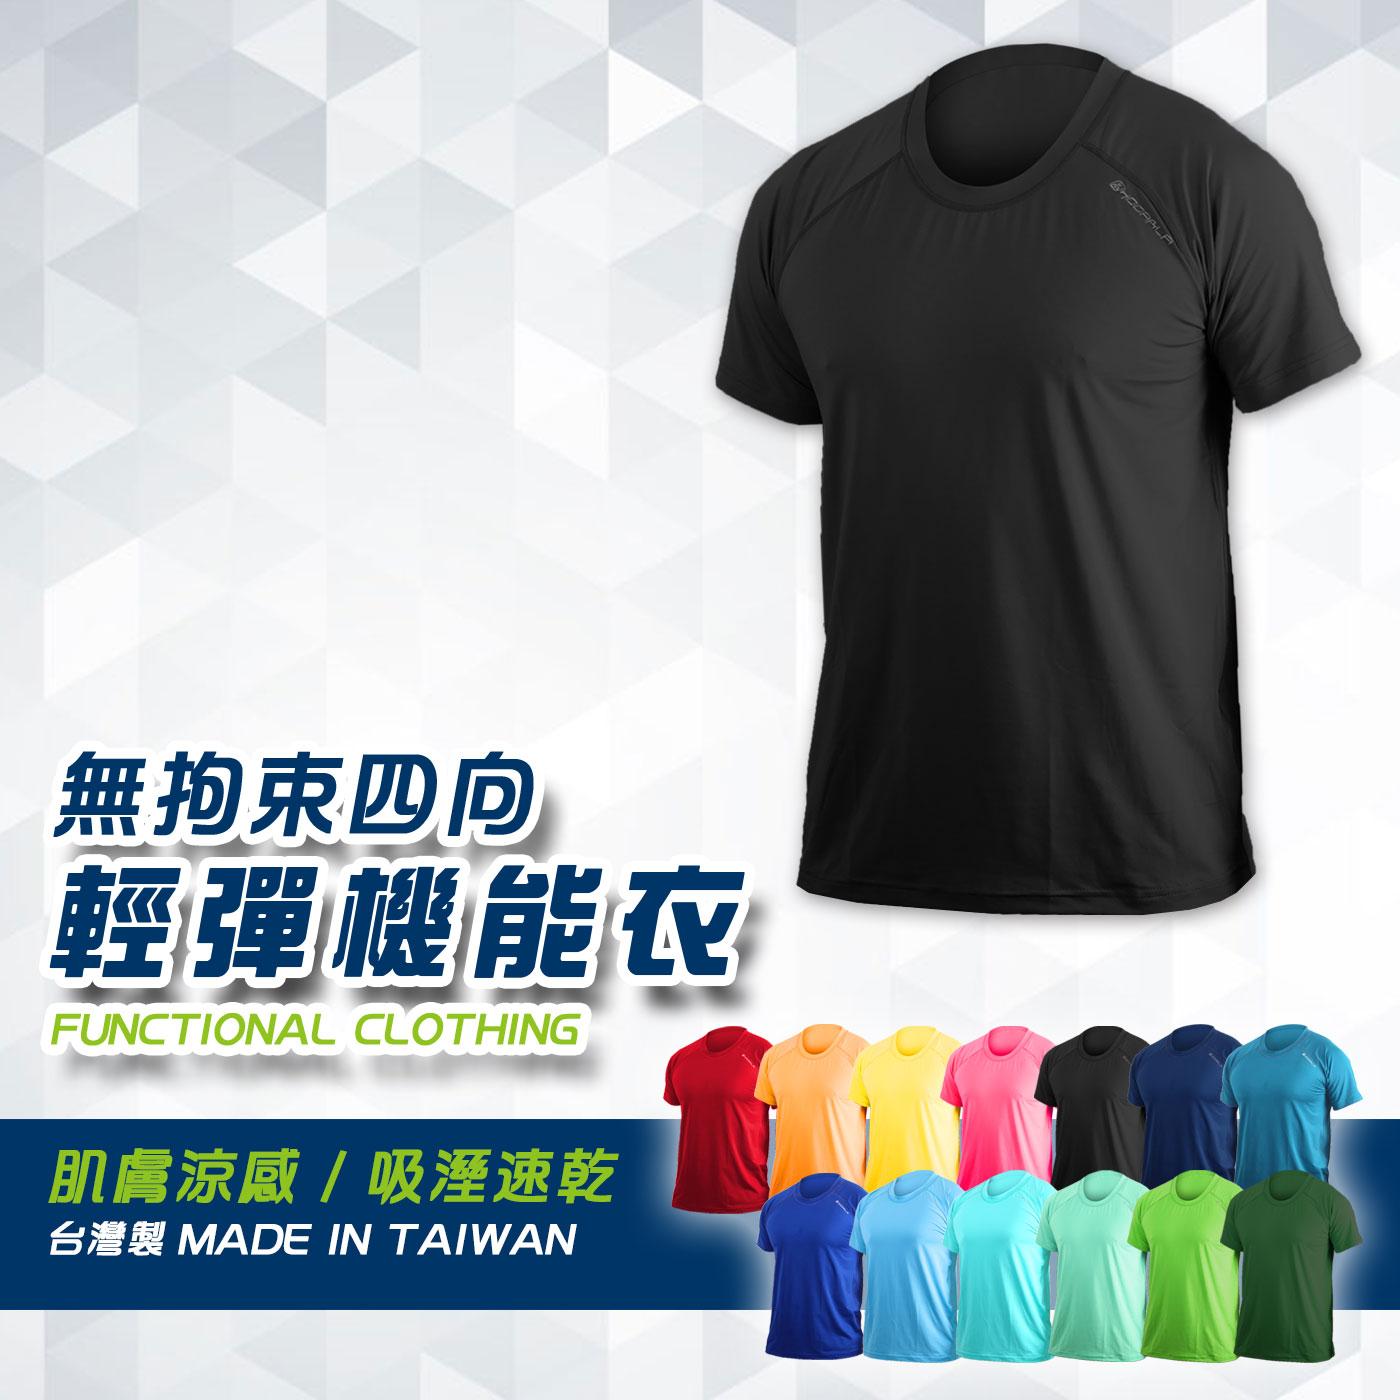 HODARLA 男女無拘束短袖T恤-輕彈 抗UV 圓領 台灣製 涼感 路跑 黑@3114813@